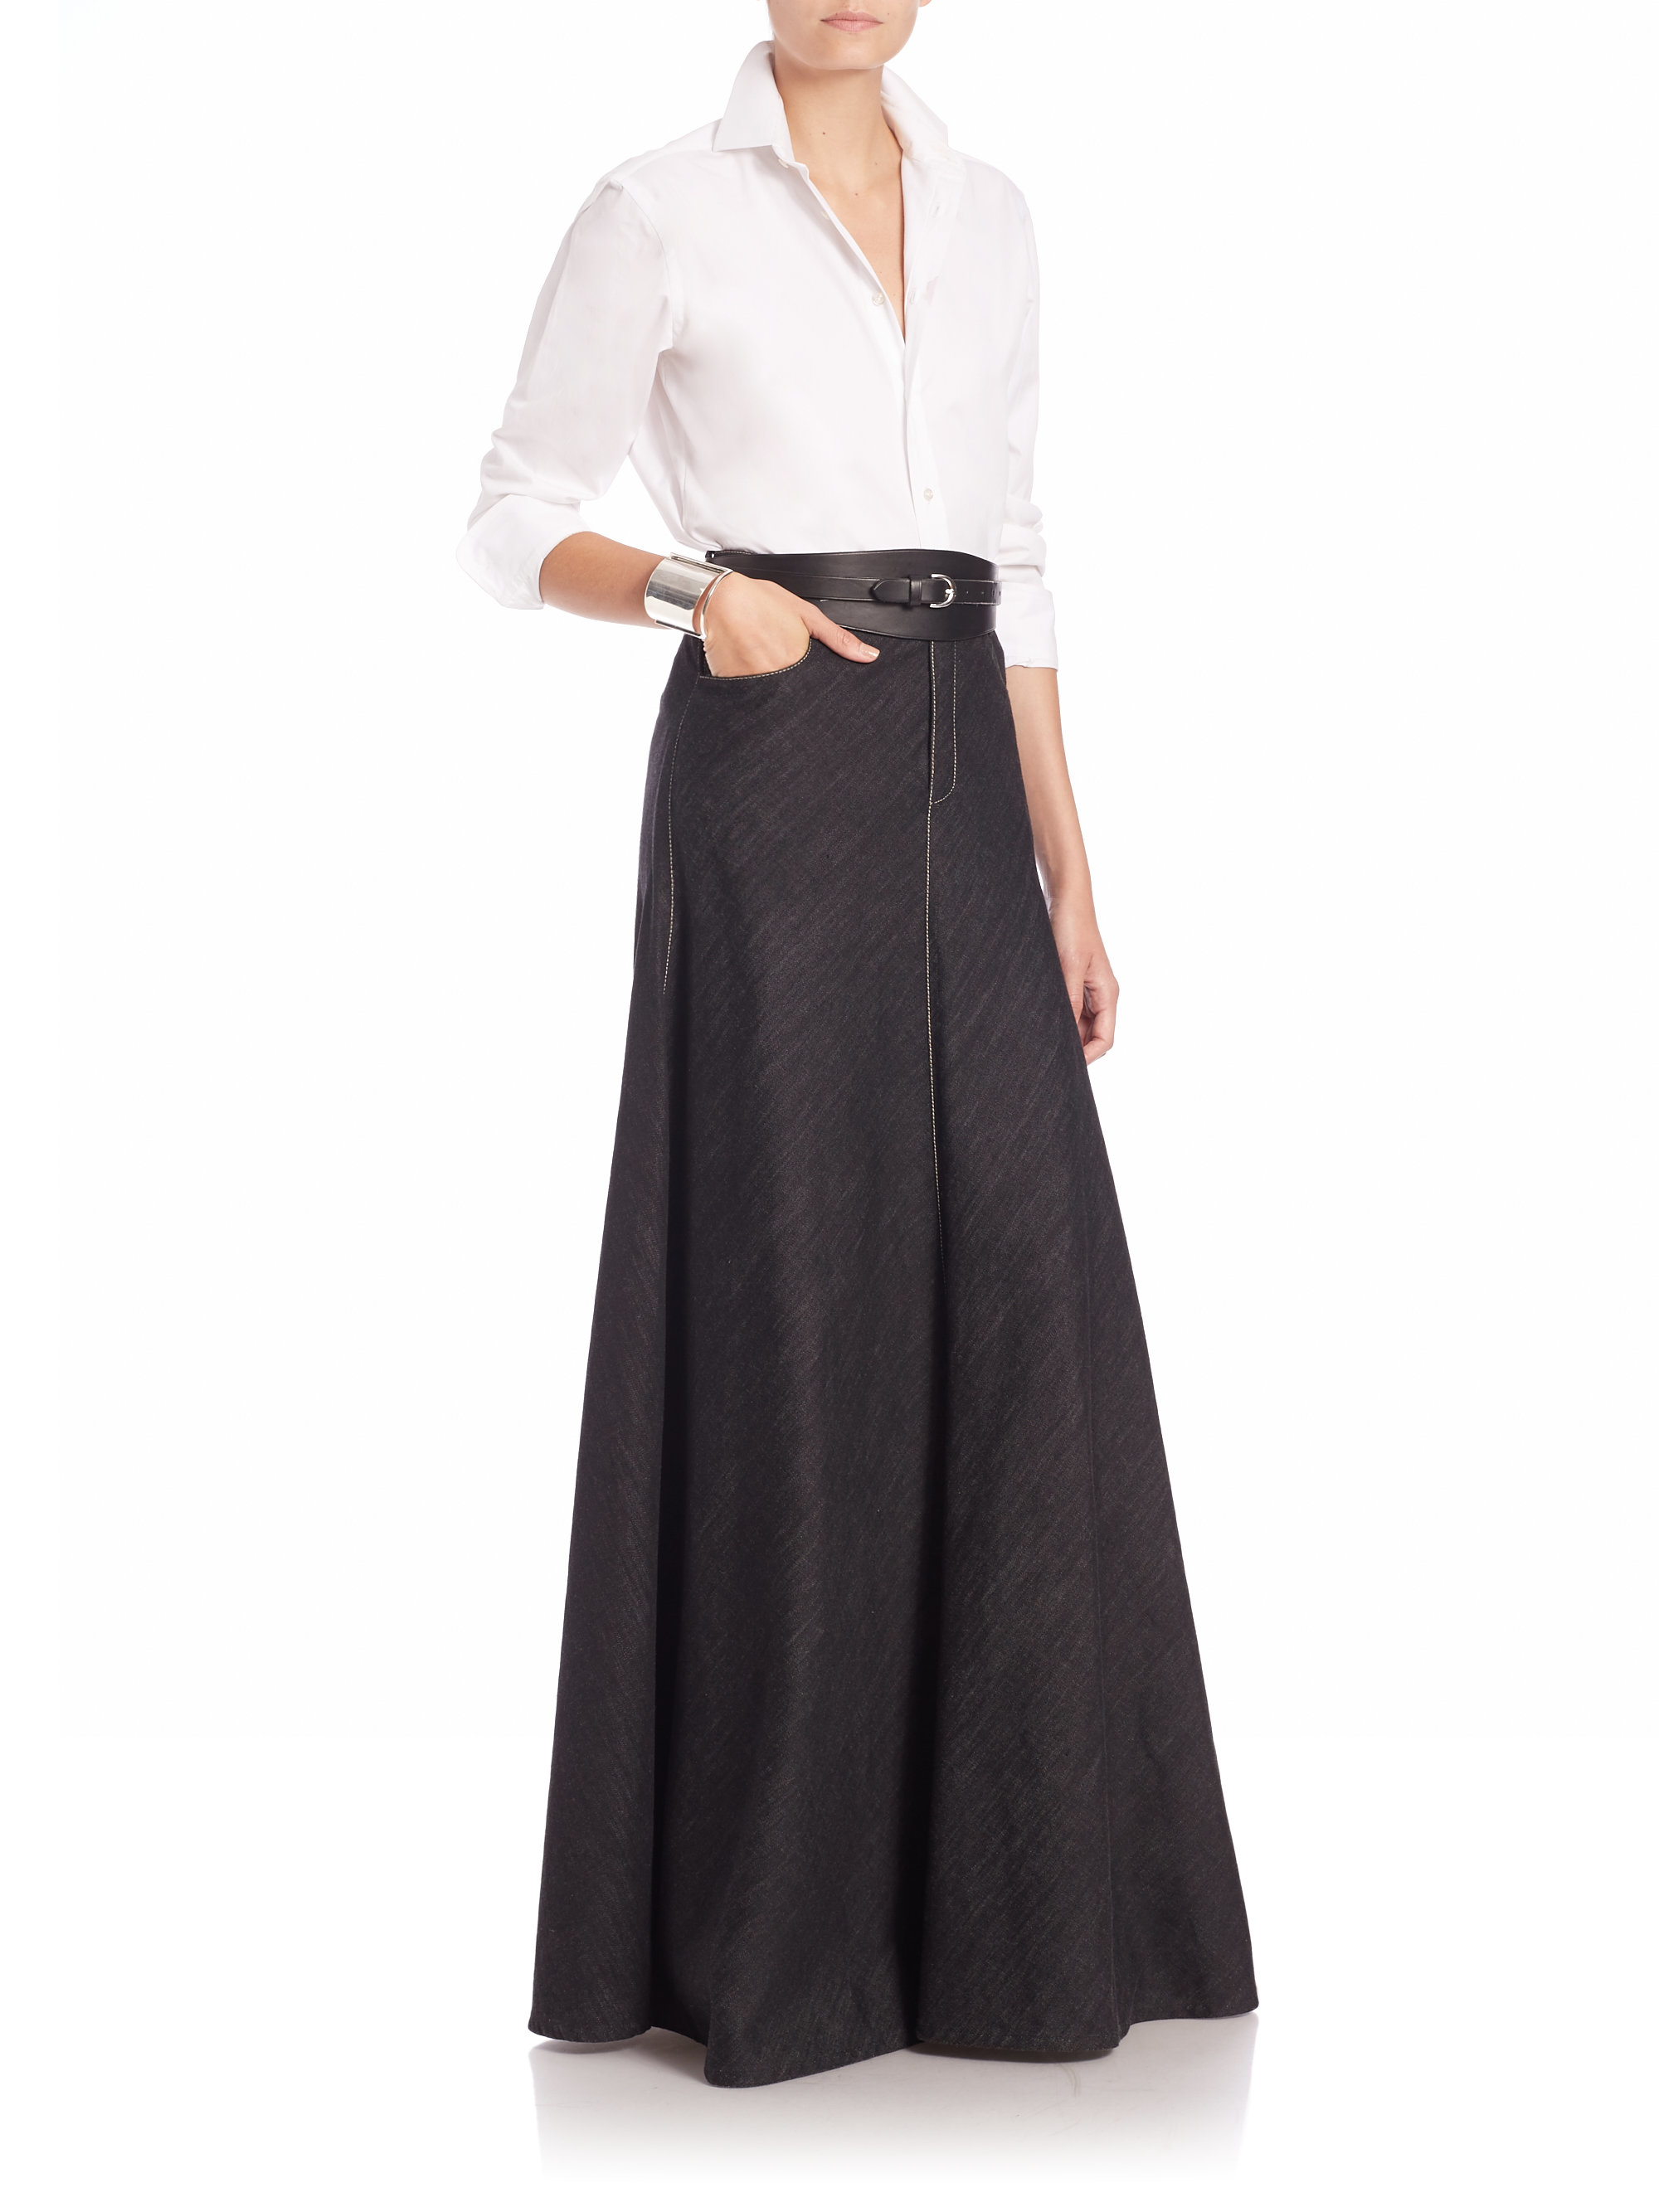 Ralph lauren collection Denisa Long Denim Skirt in Black | Lyst